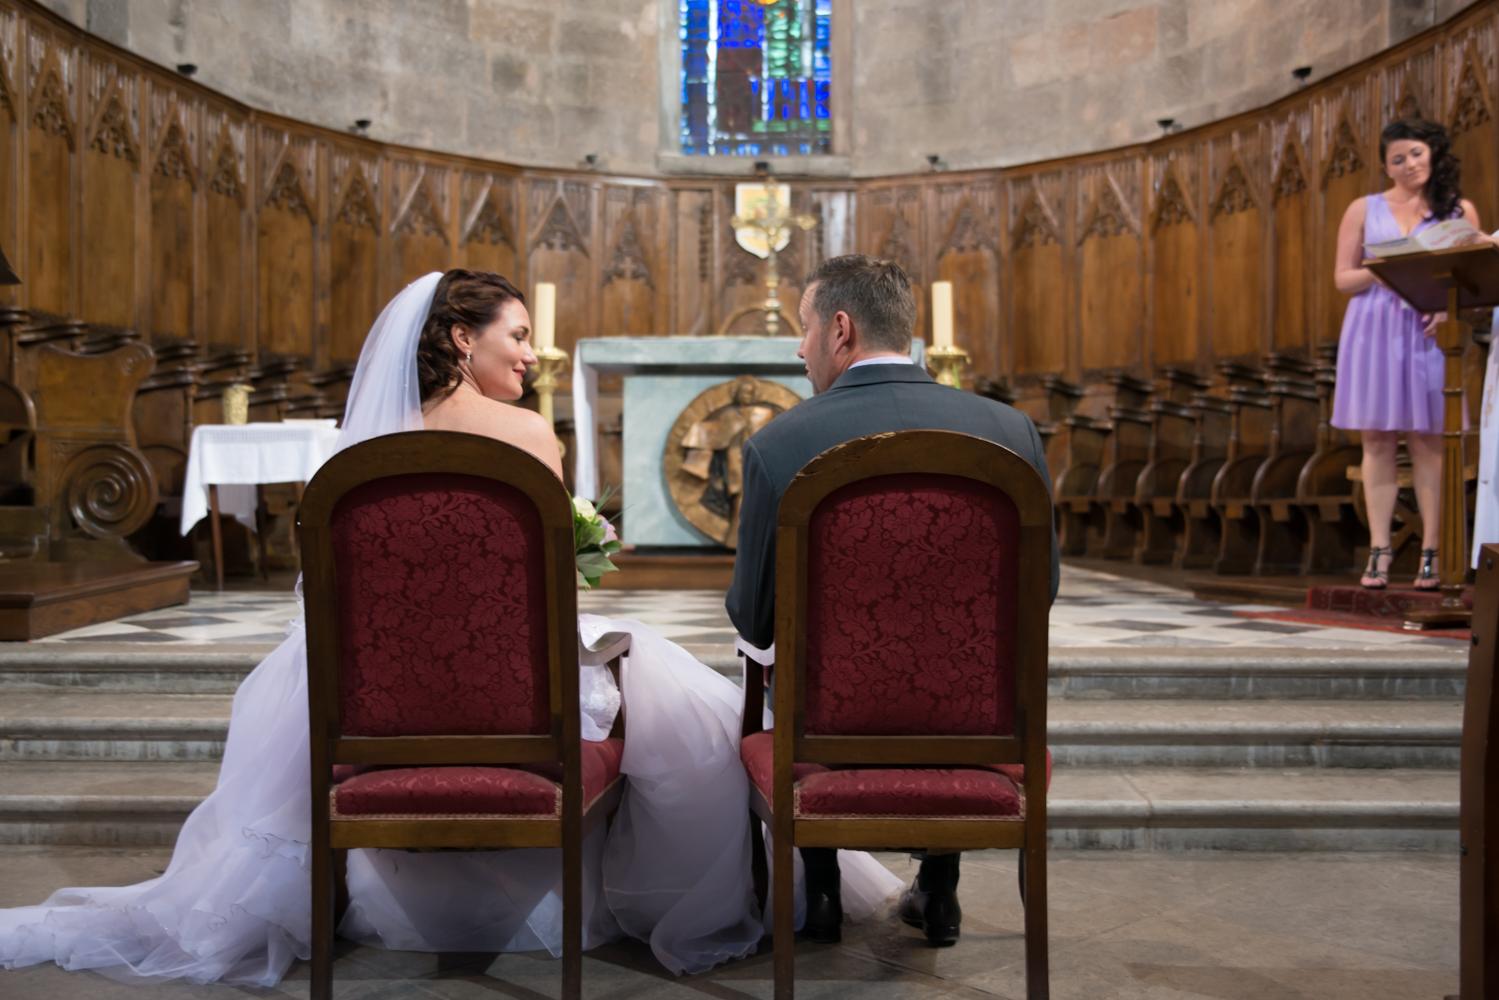 JLP photographe mariage Var et PACA (29)